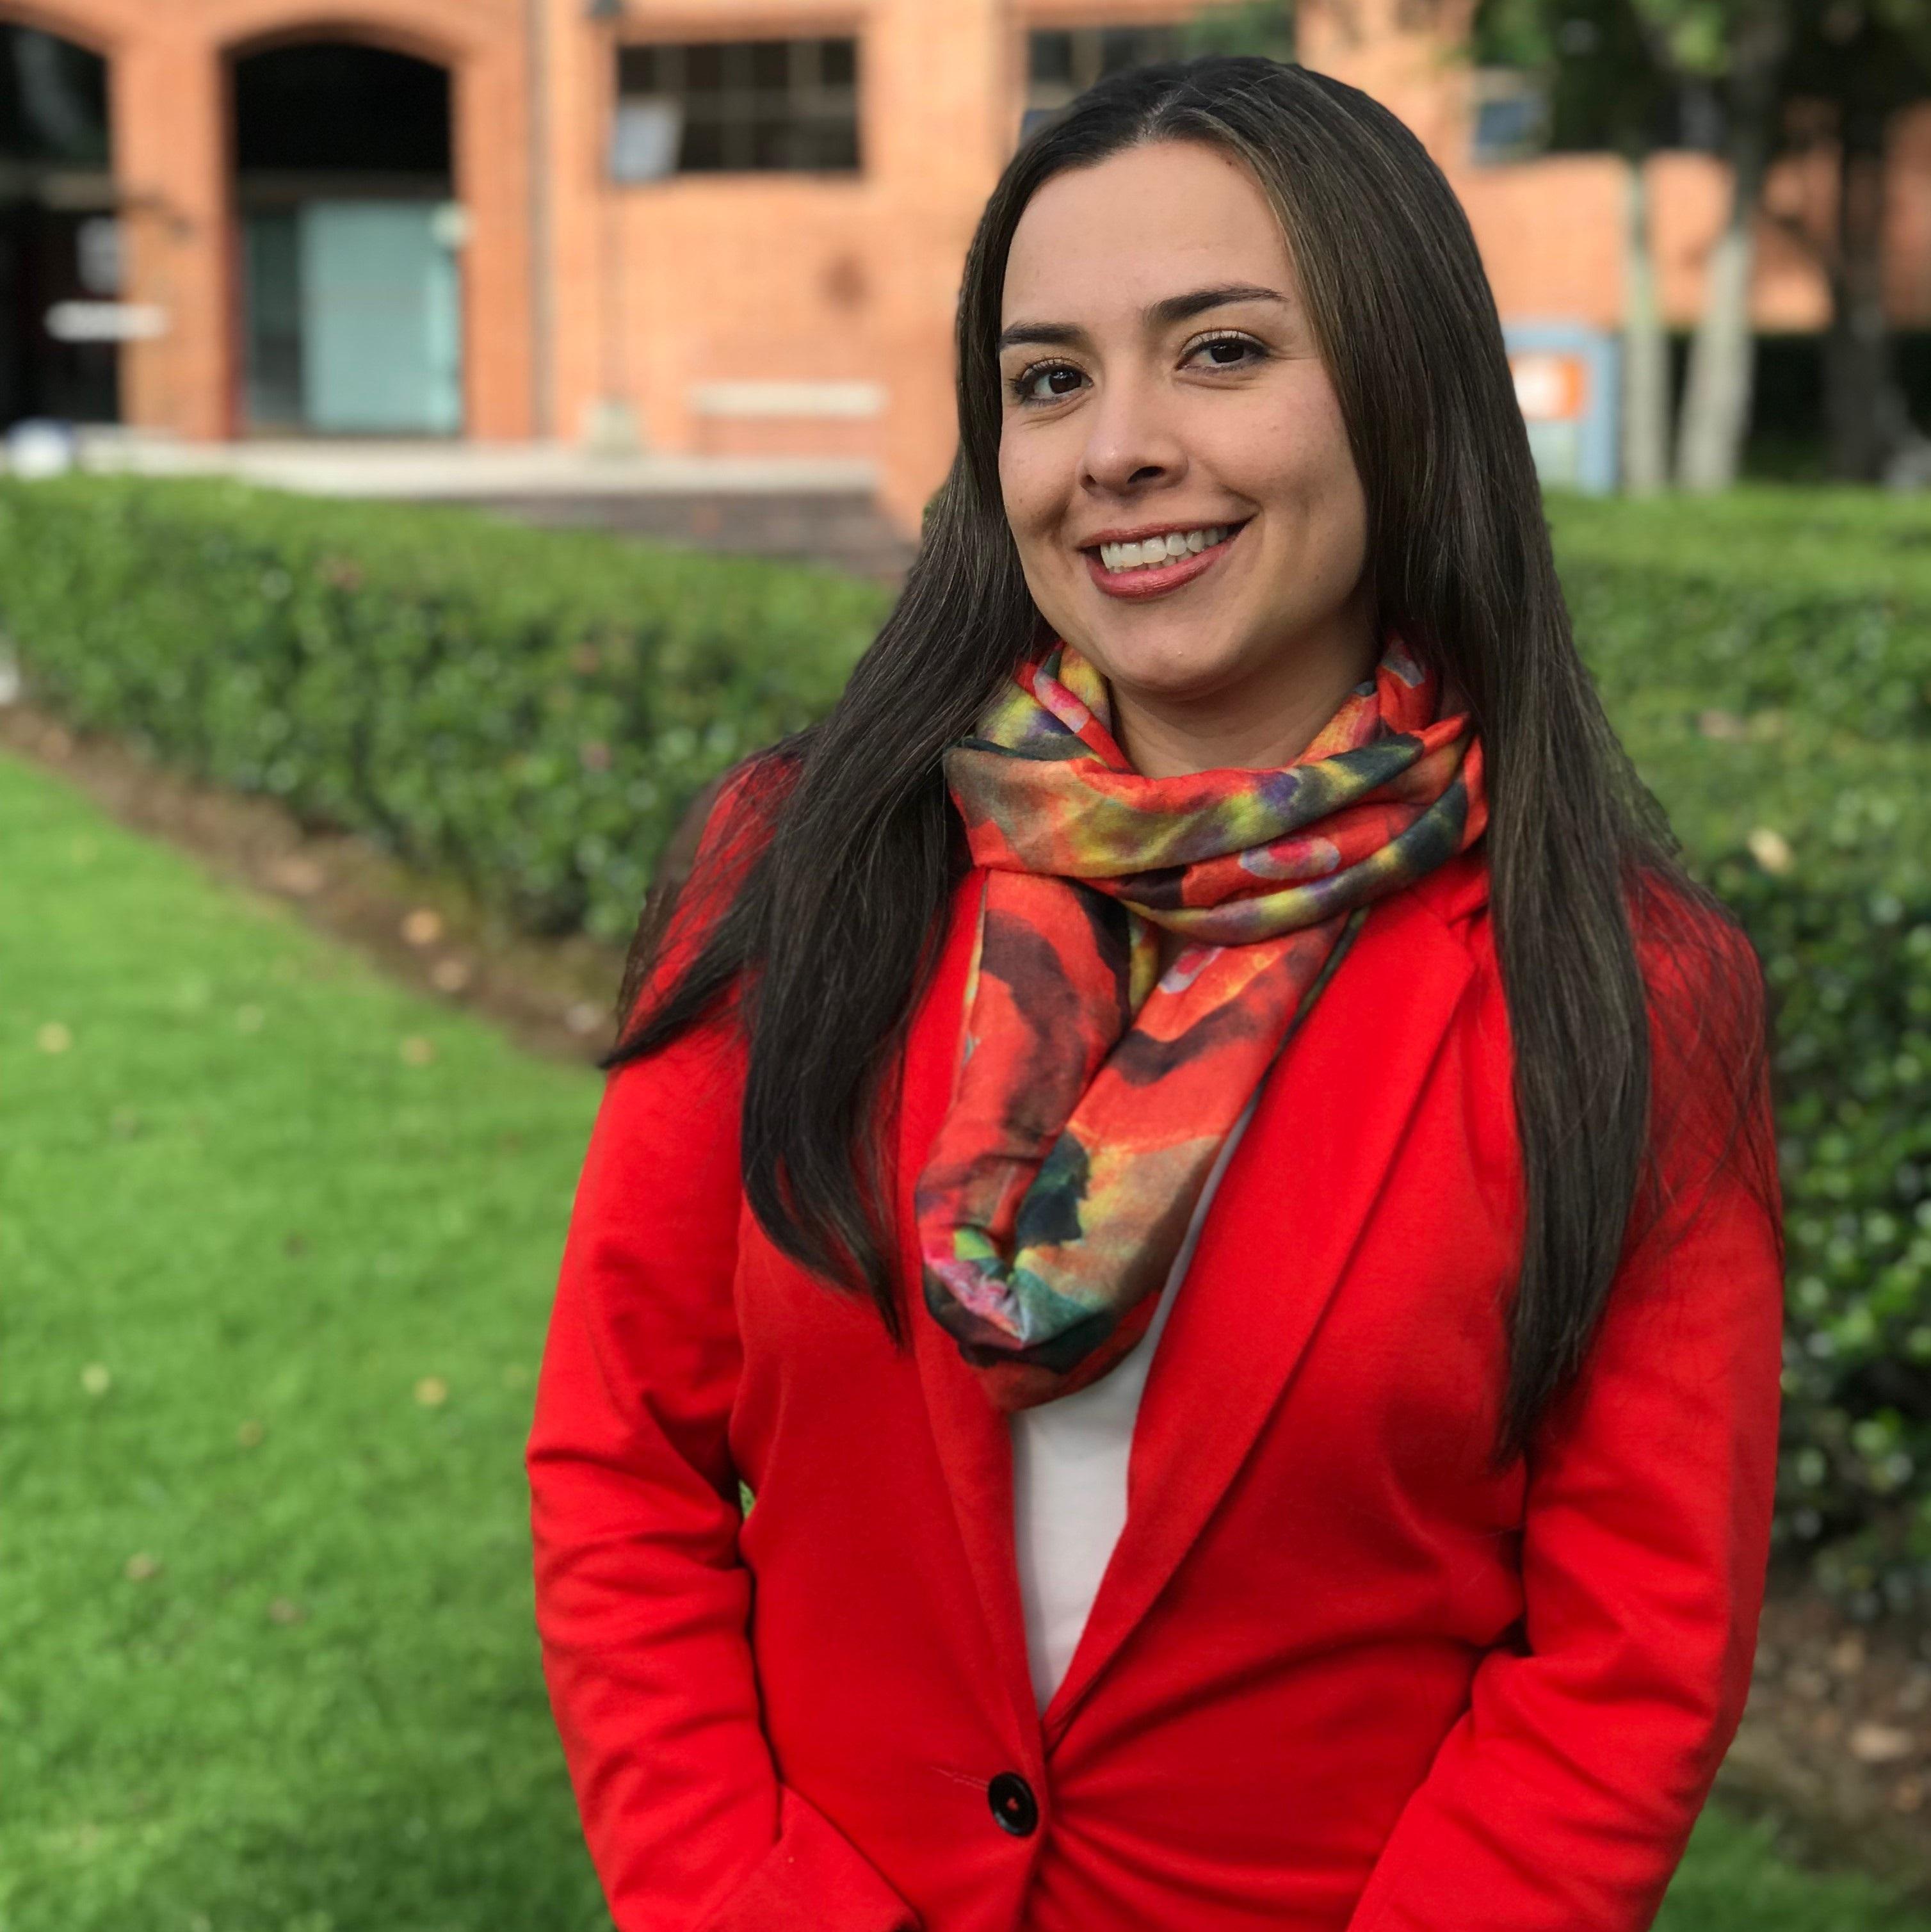 María Fernanda Hernández Beltrán